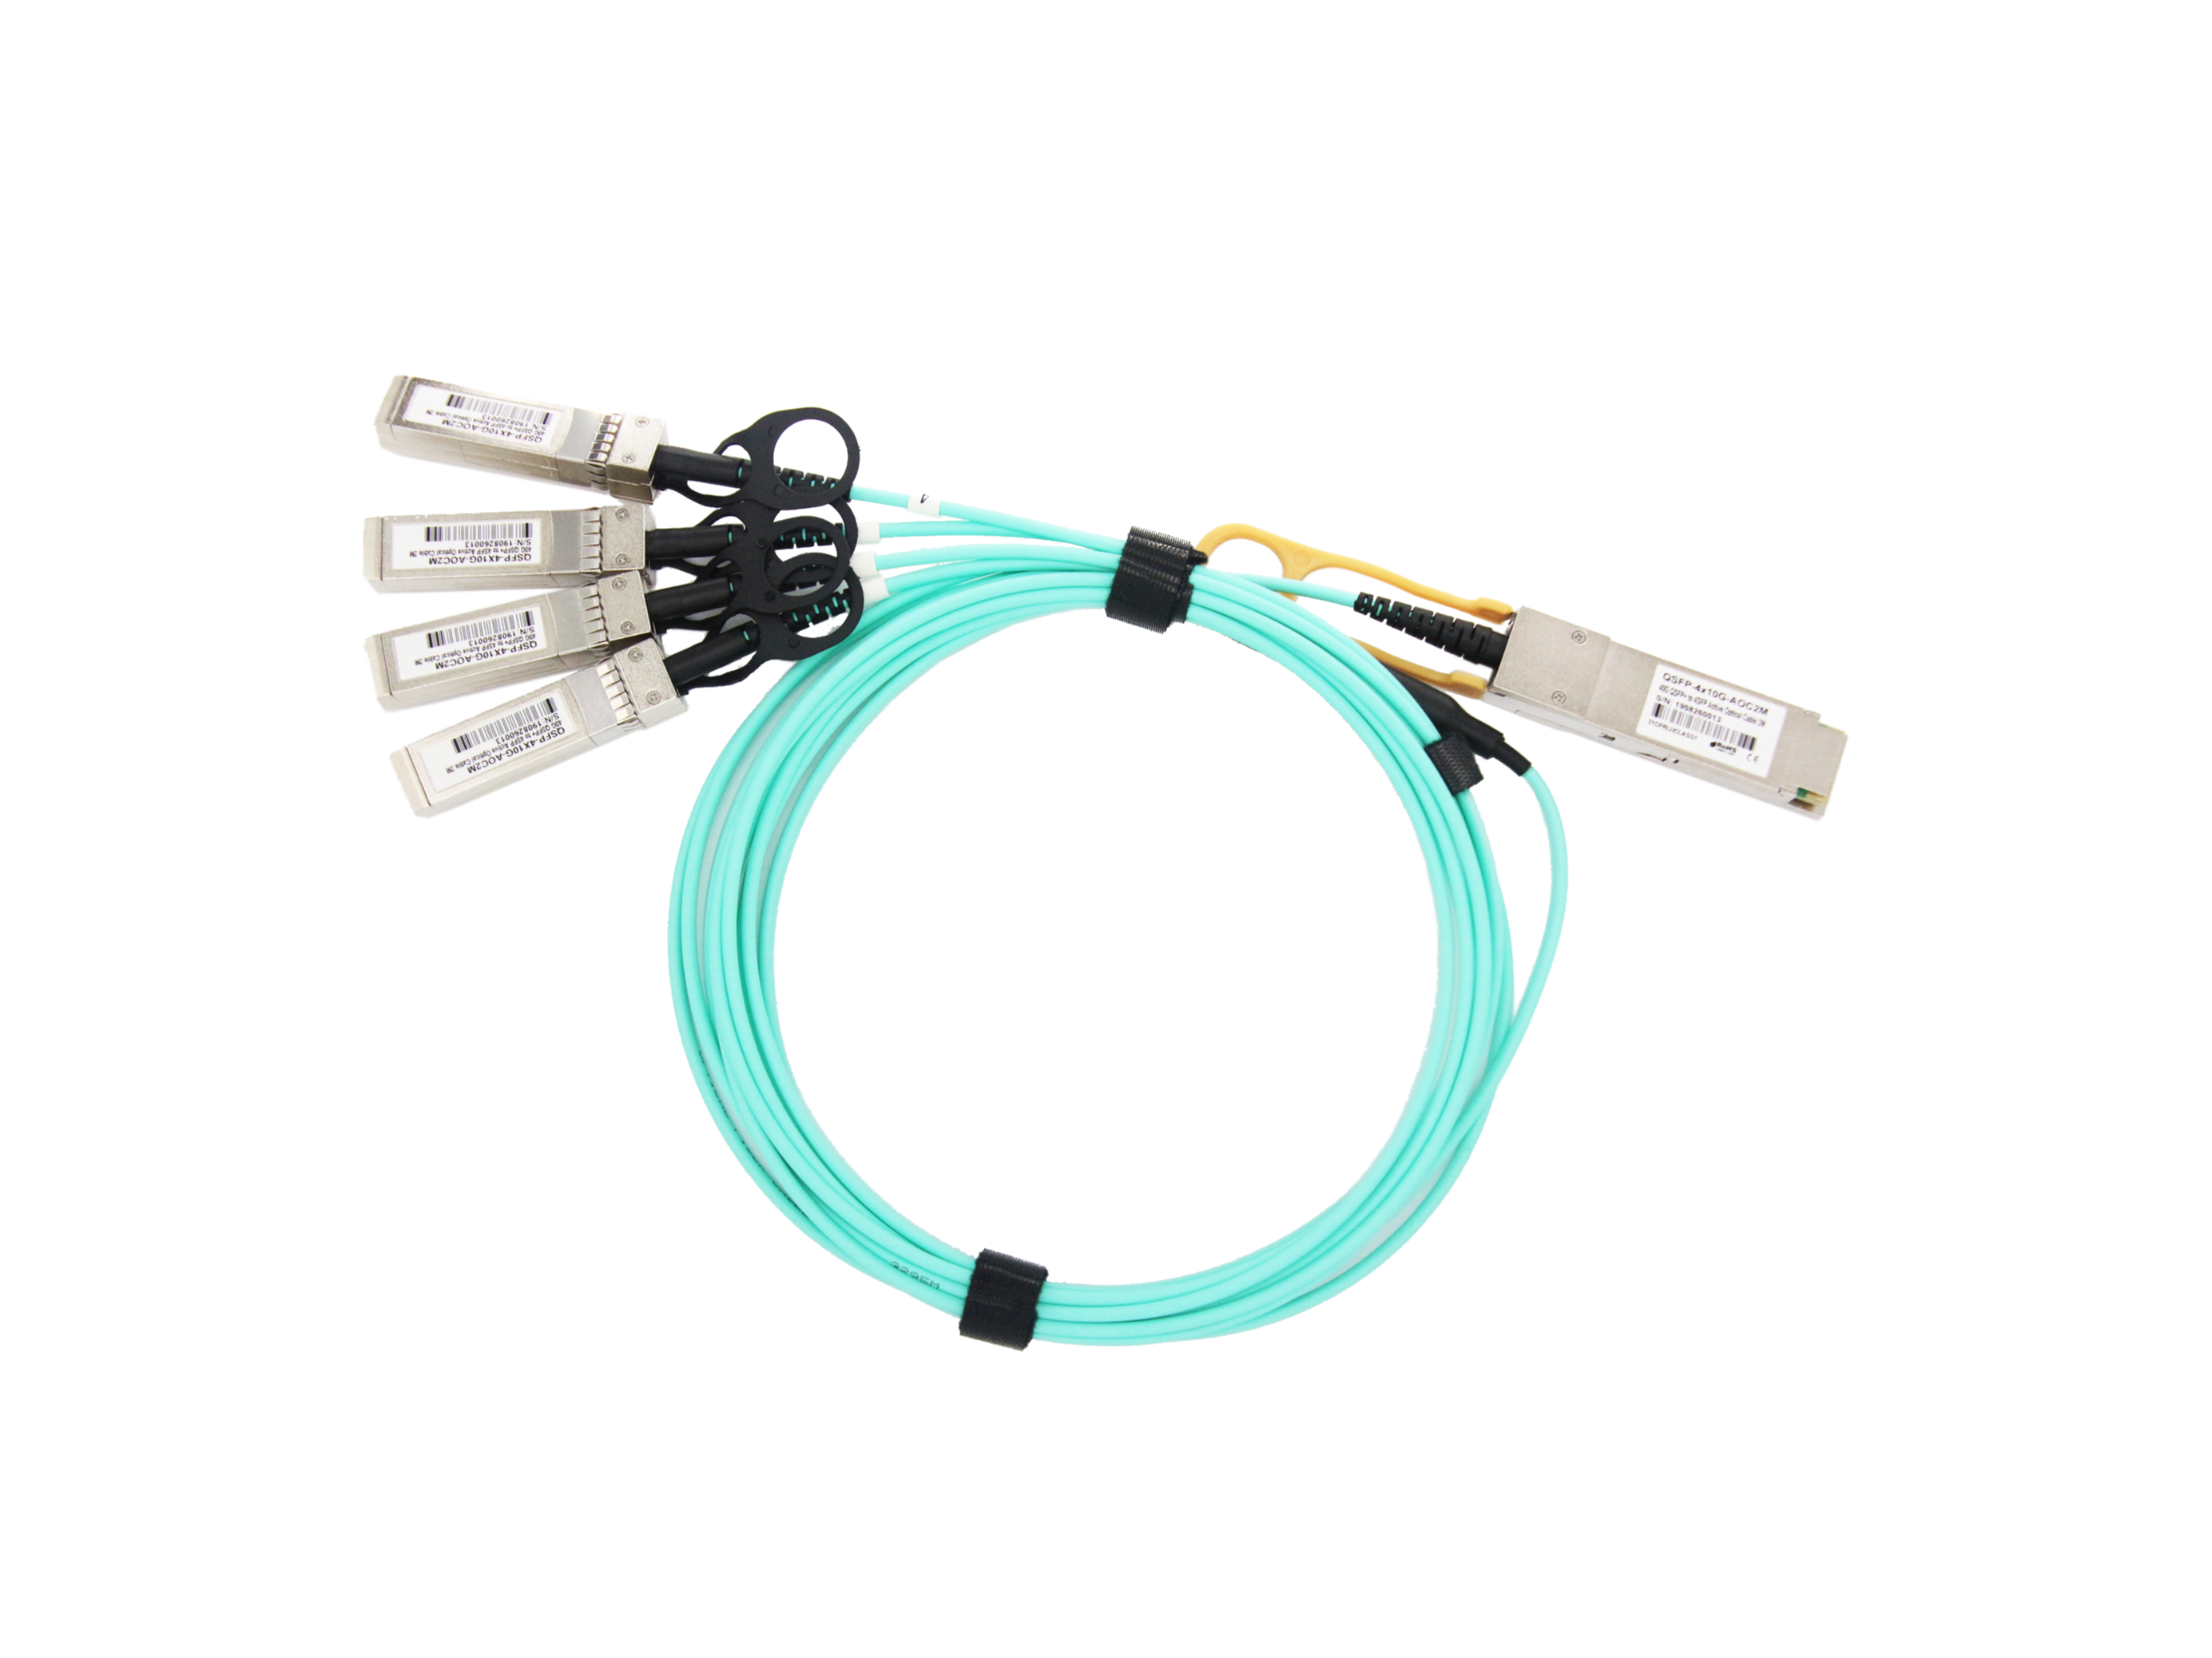 极进(Extreme)兼容10GB-4-F01-QSFP QSFP+ 转 4SFP+ AOC高速光缆